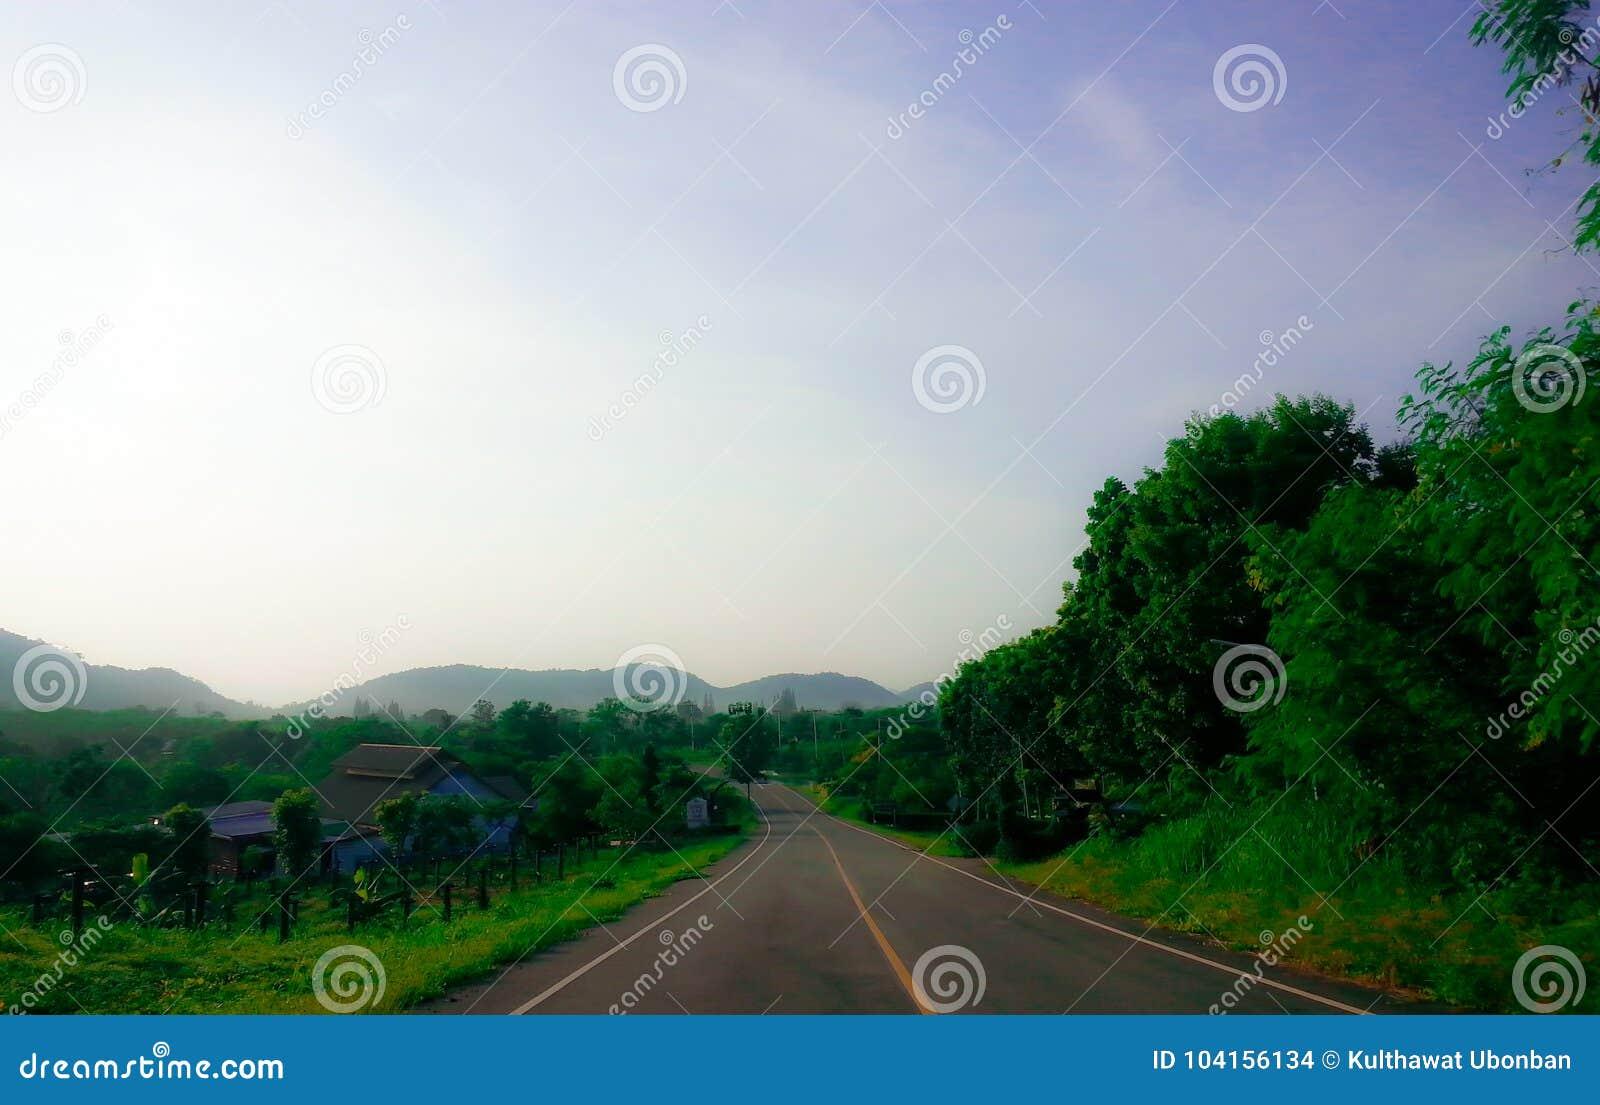 Road to dark tree